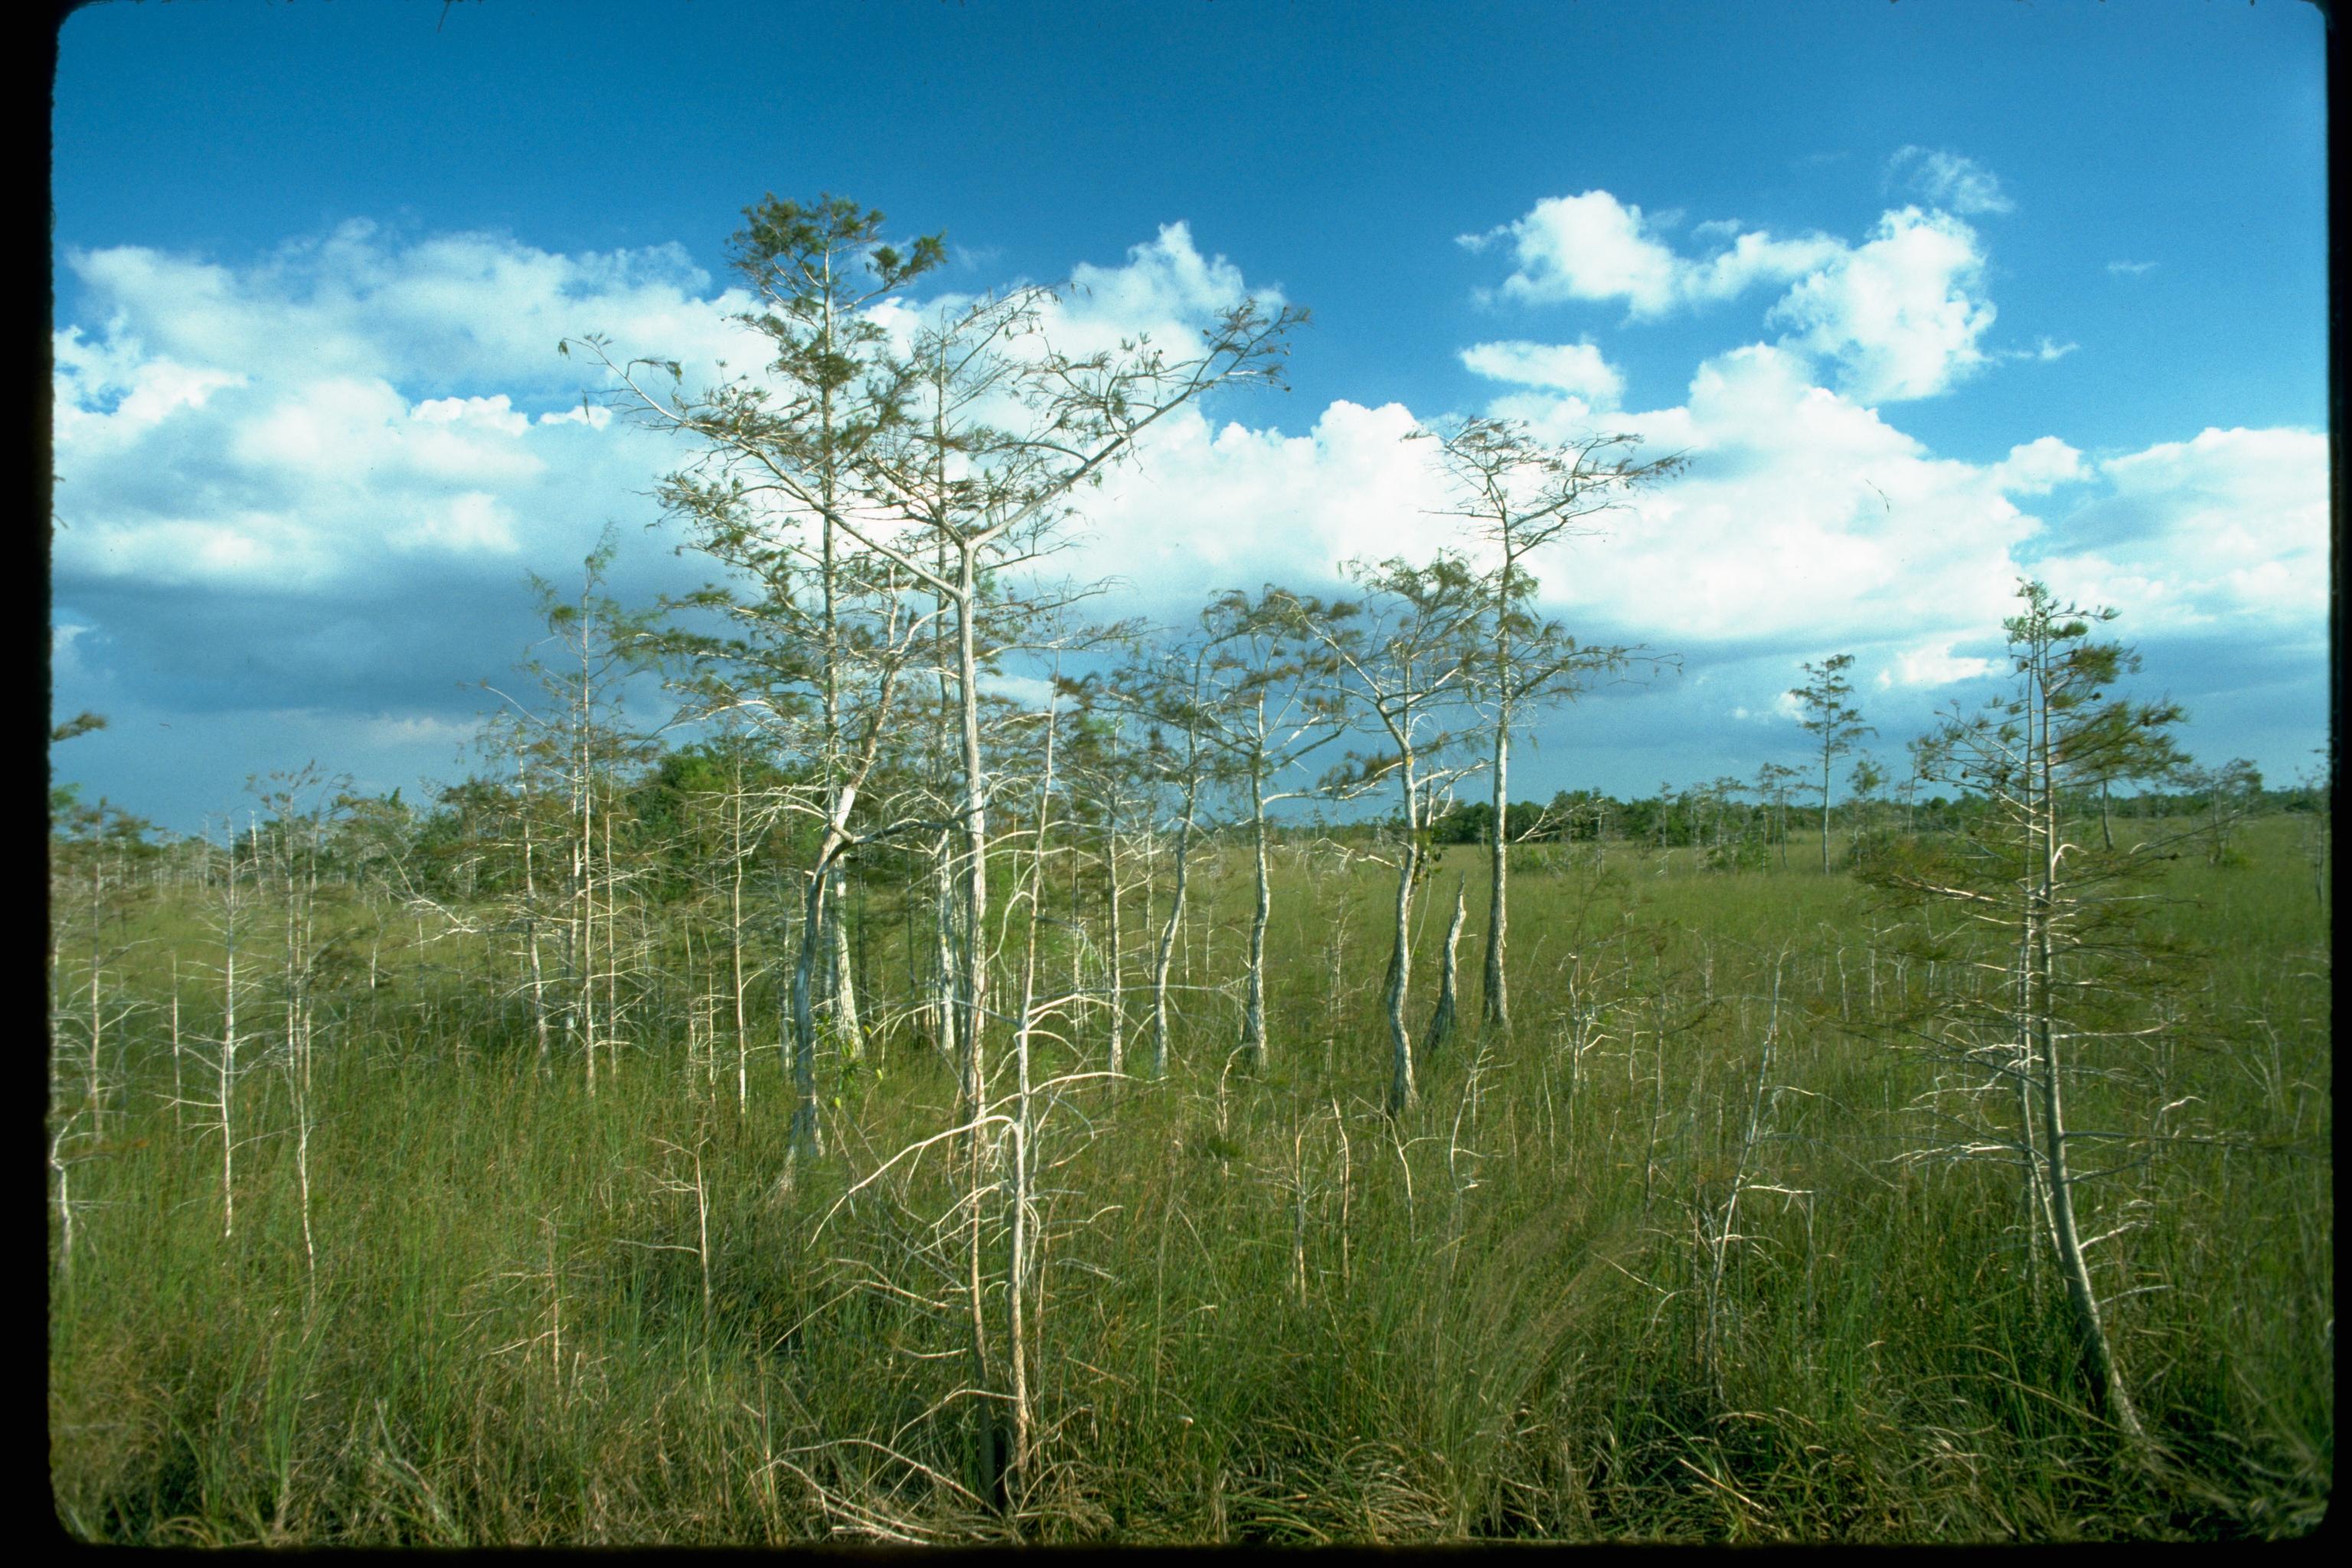 Mahagonibäume  File:Everglades National Park EVER1646.jpg - Wikimedia Commons